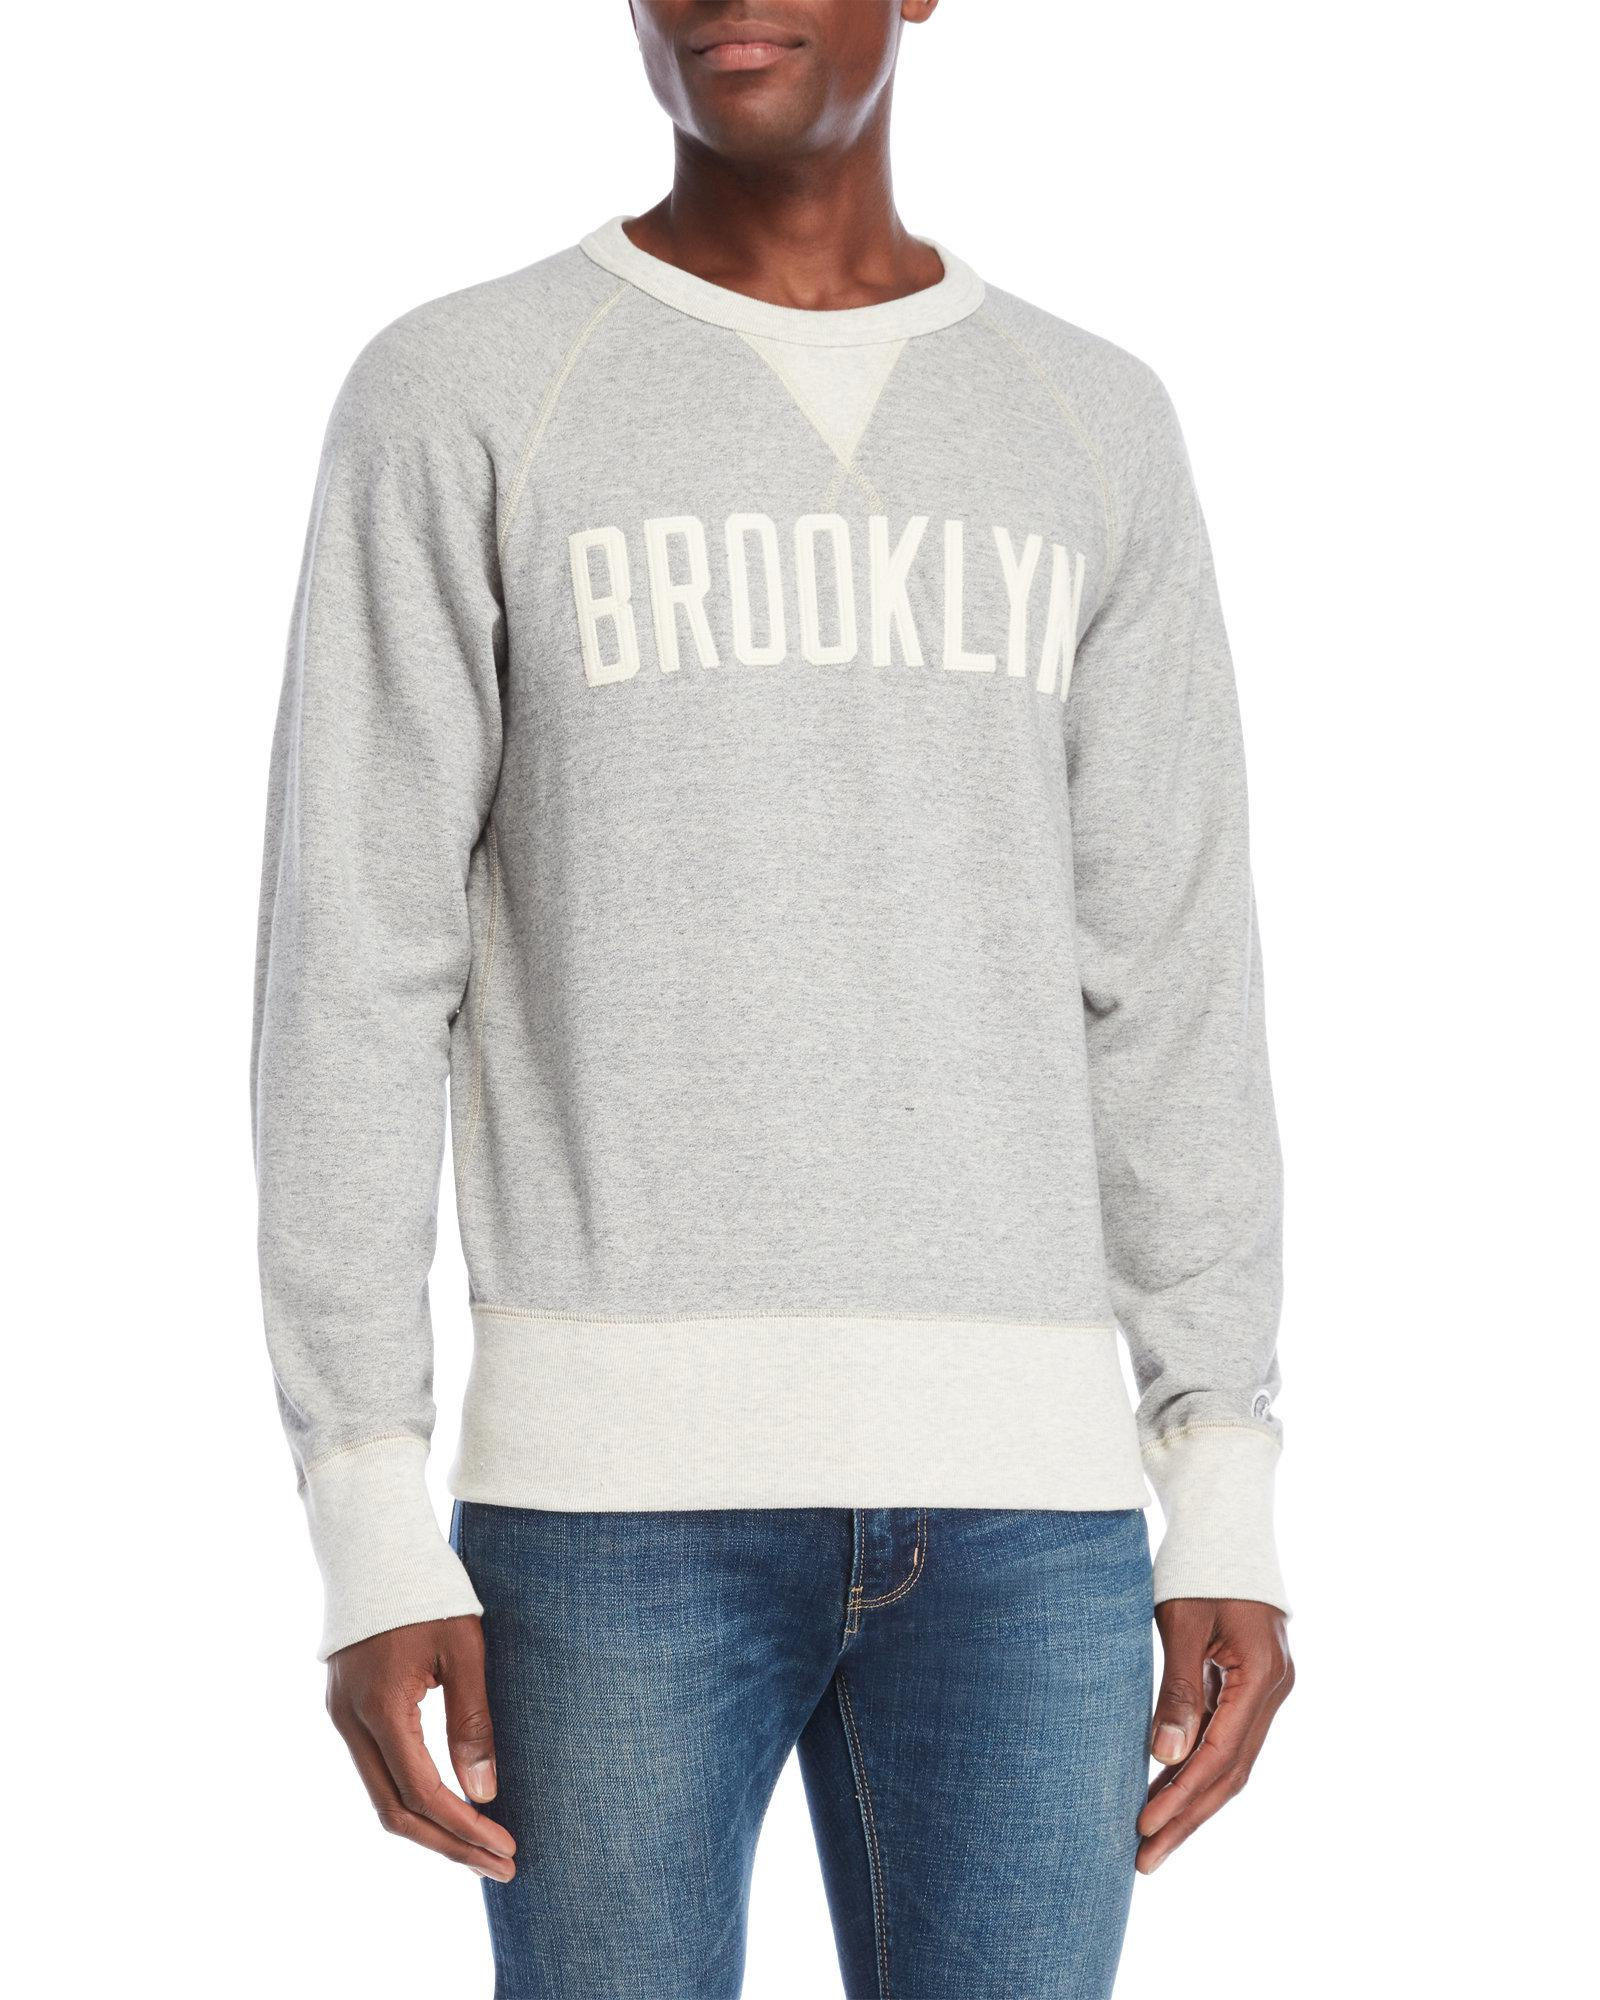 0be794f90bb6 Lyst - Champion Grey Brooklyn Sweatshirt in Gray for Men